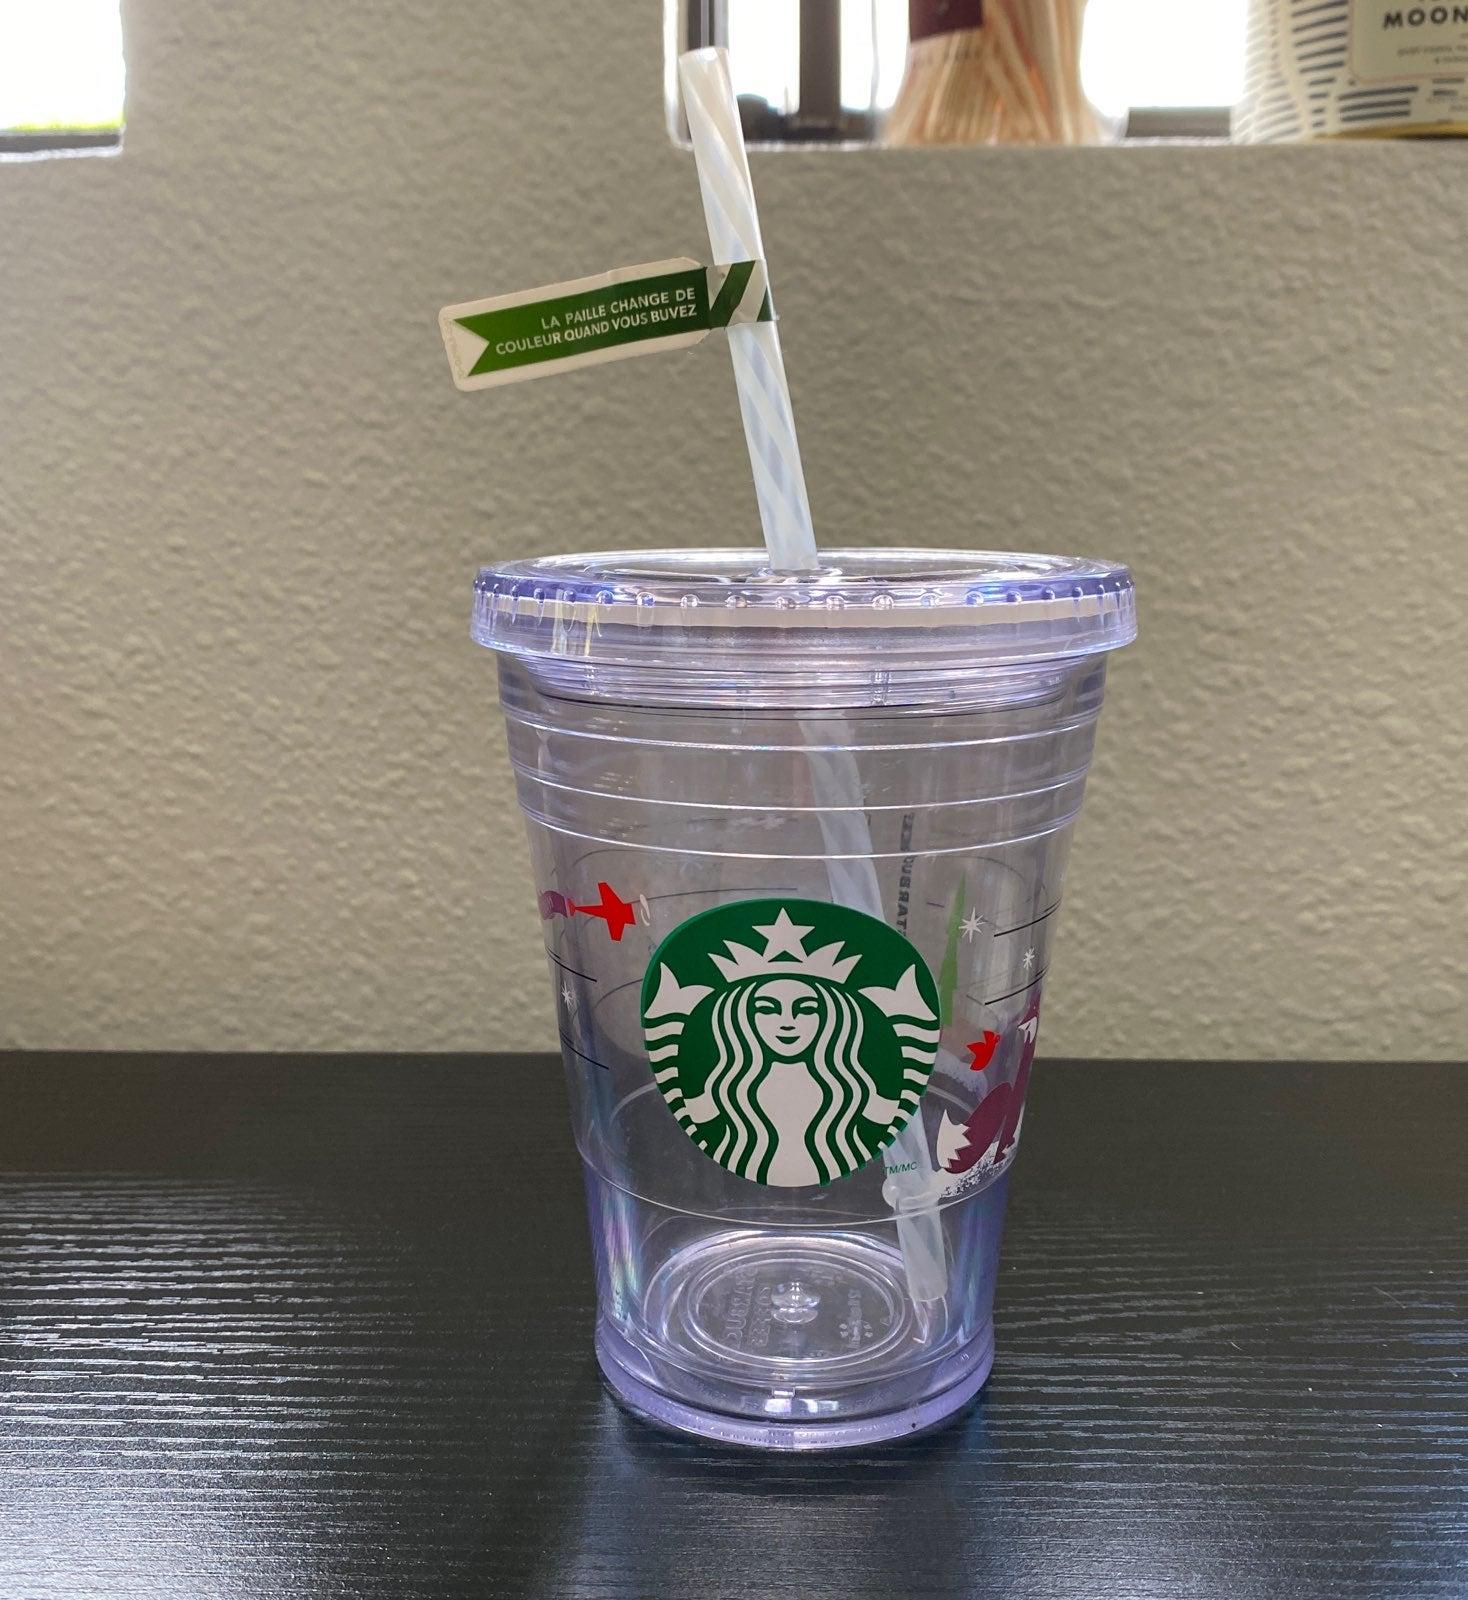 Cute 12oz Venti Starbucks Tumbler